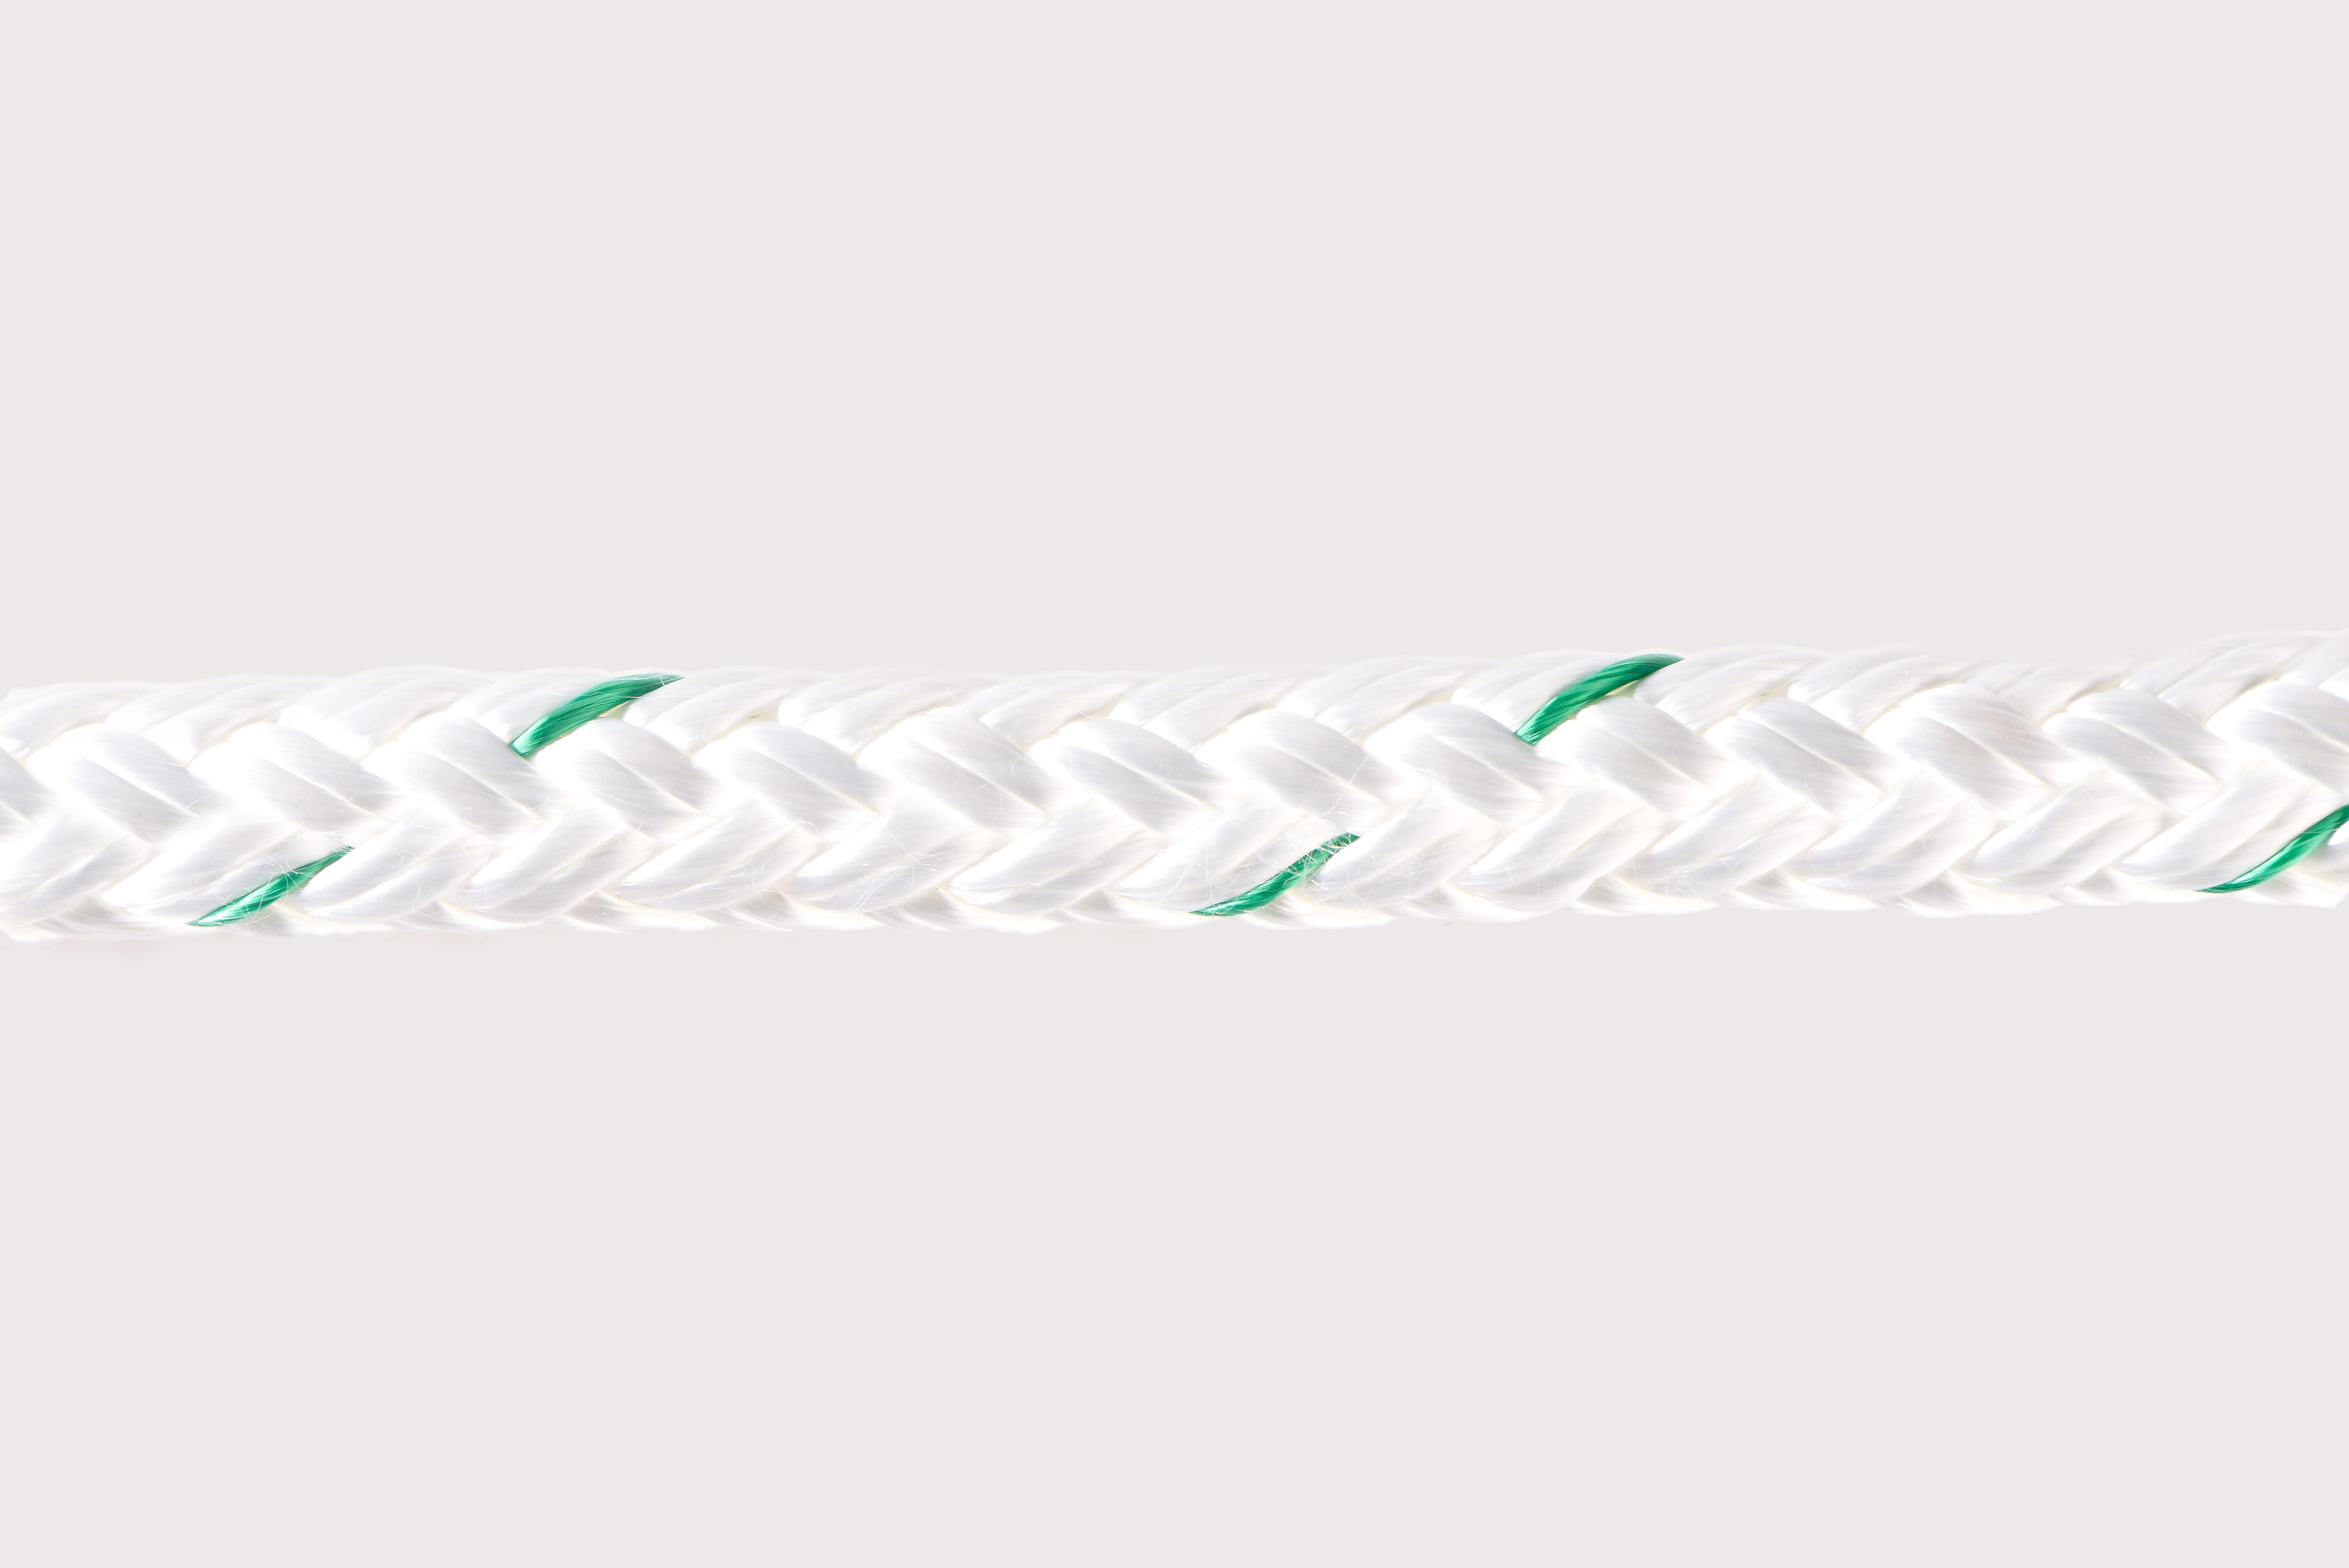 Orion-Cordage-Esterplex 12-Strand Polyester (Two-In-Train)-White I Green-Horizontal80.jpg